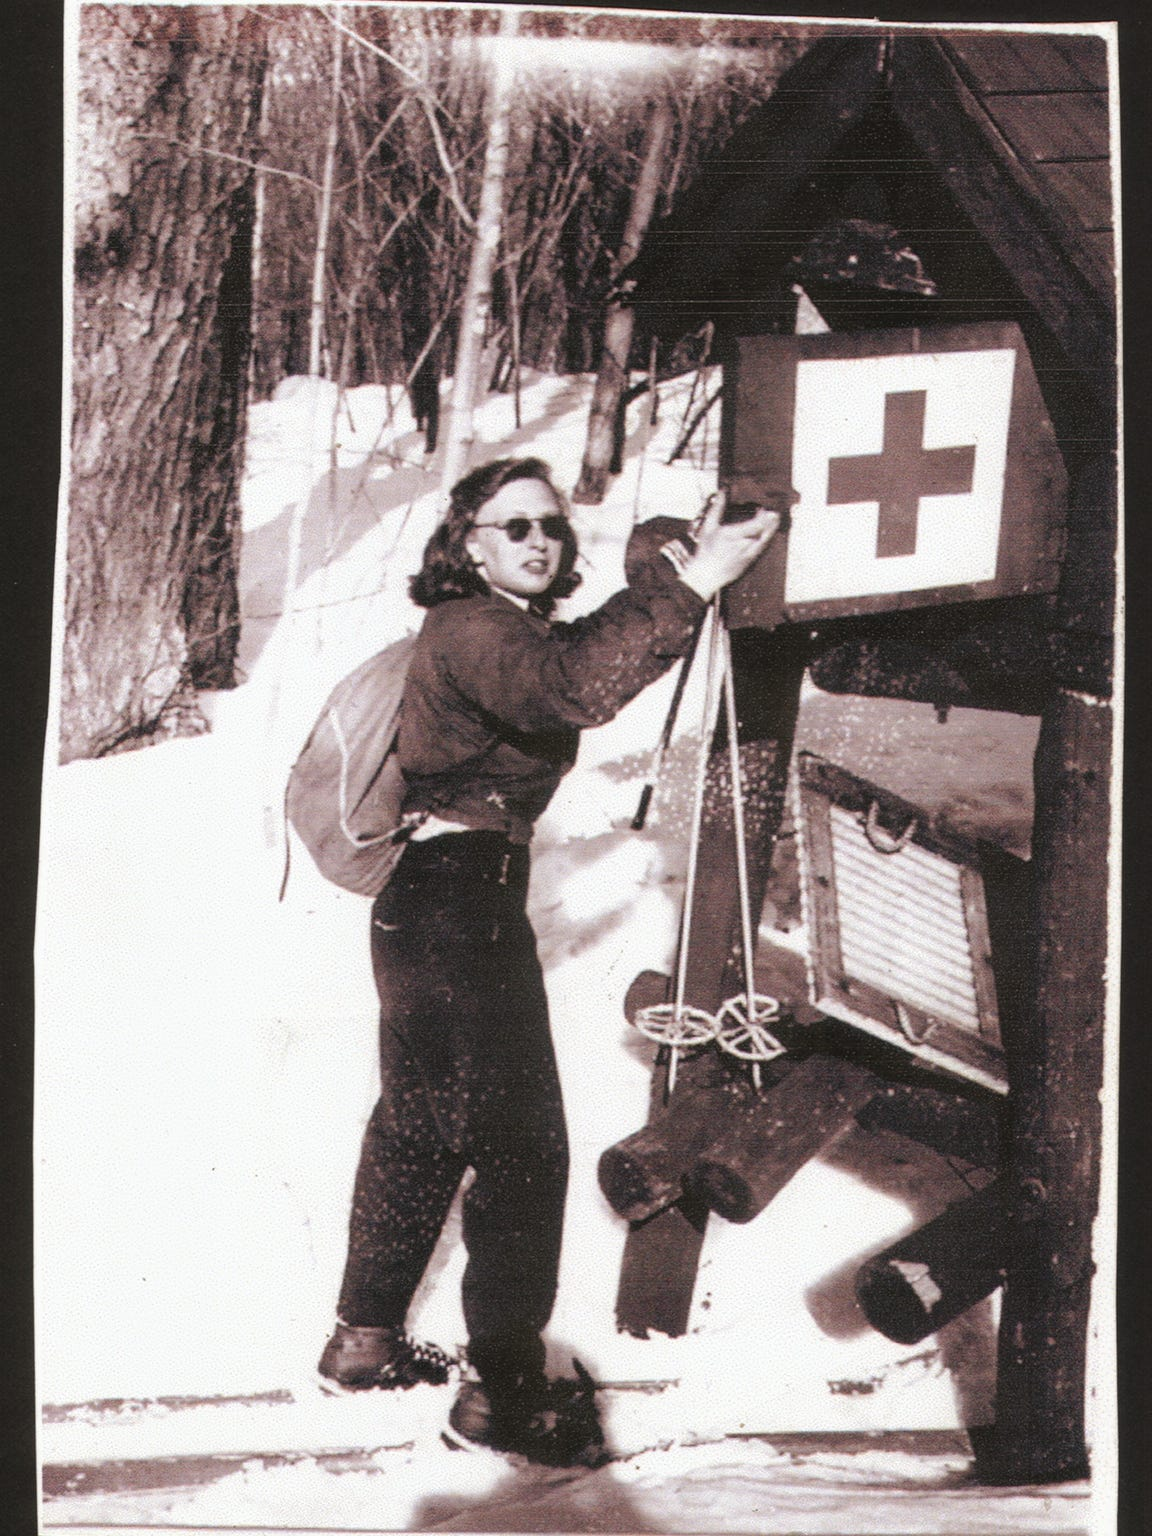 Circa 1944 photo of ski patroller Betty Ware at a first